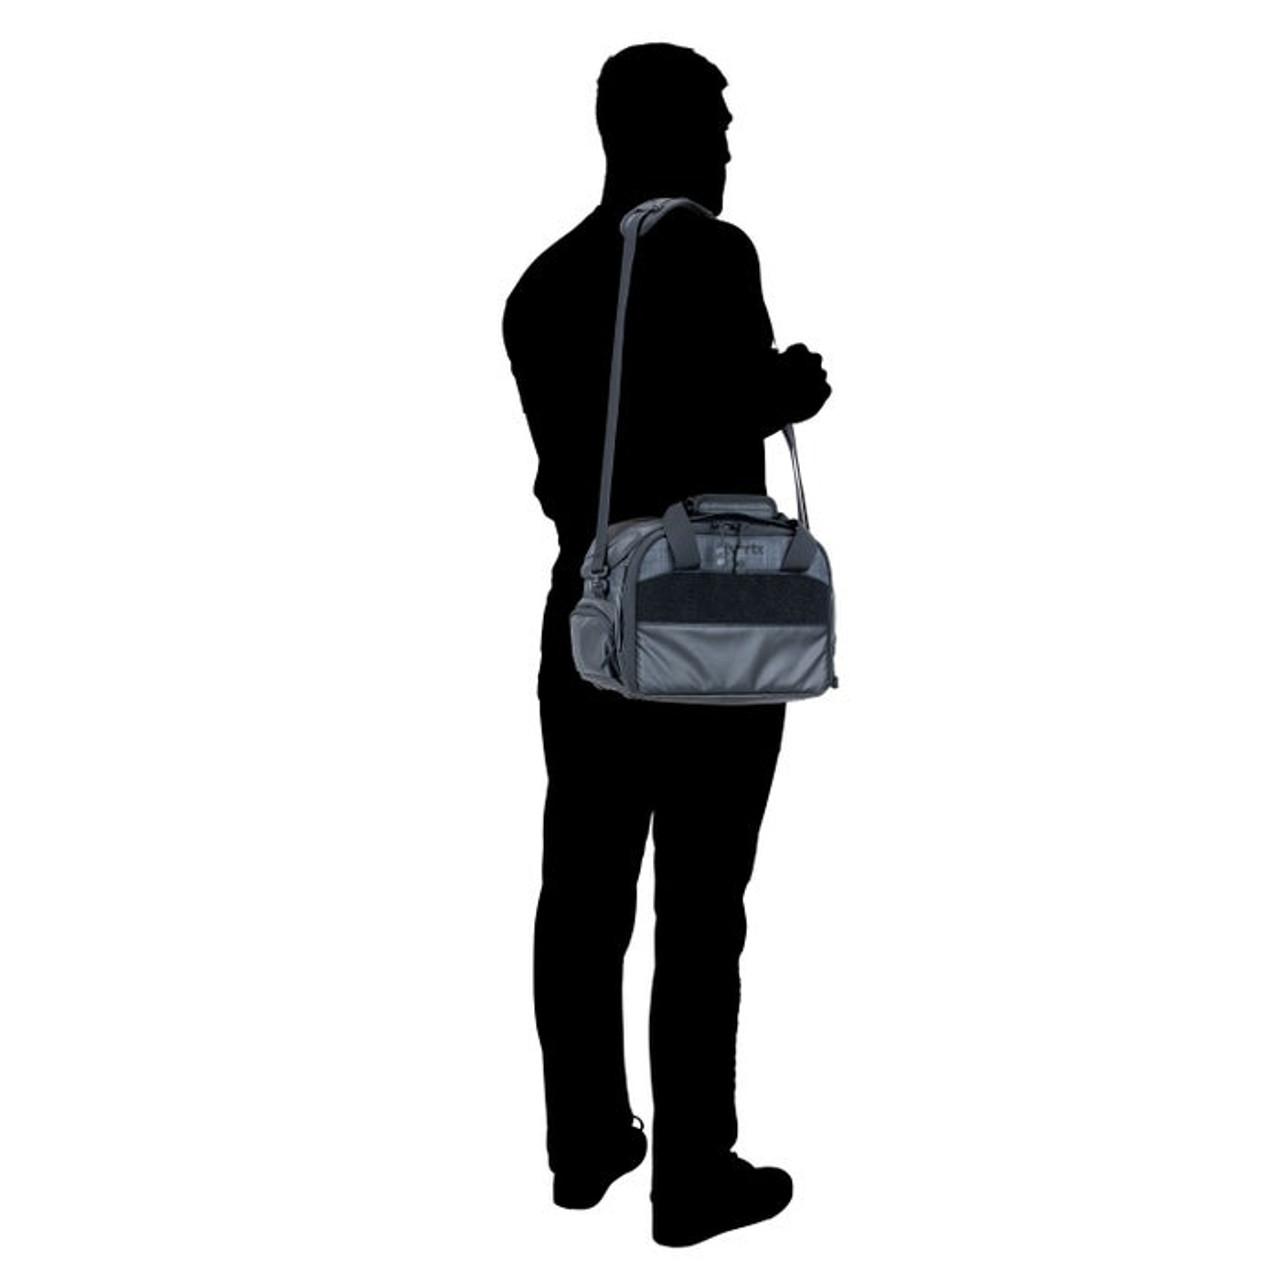 Vertx COF Light Range Bag (Heather Black/Galaxy Black)